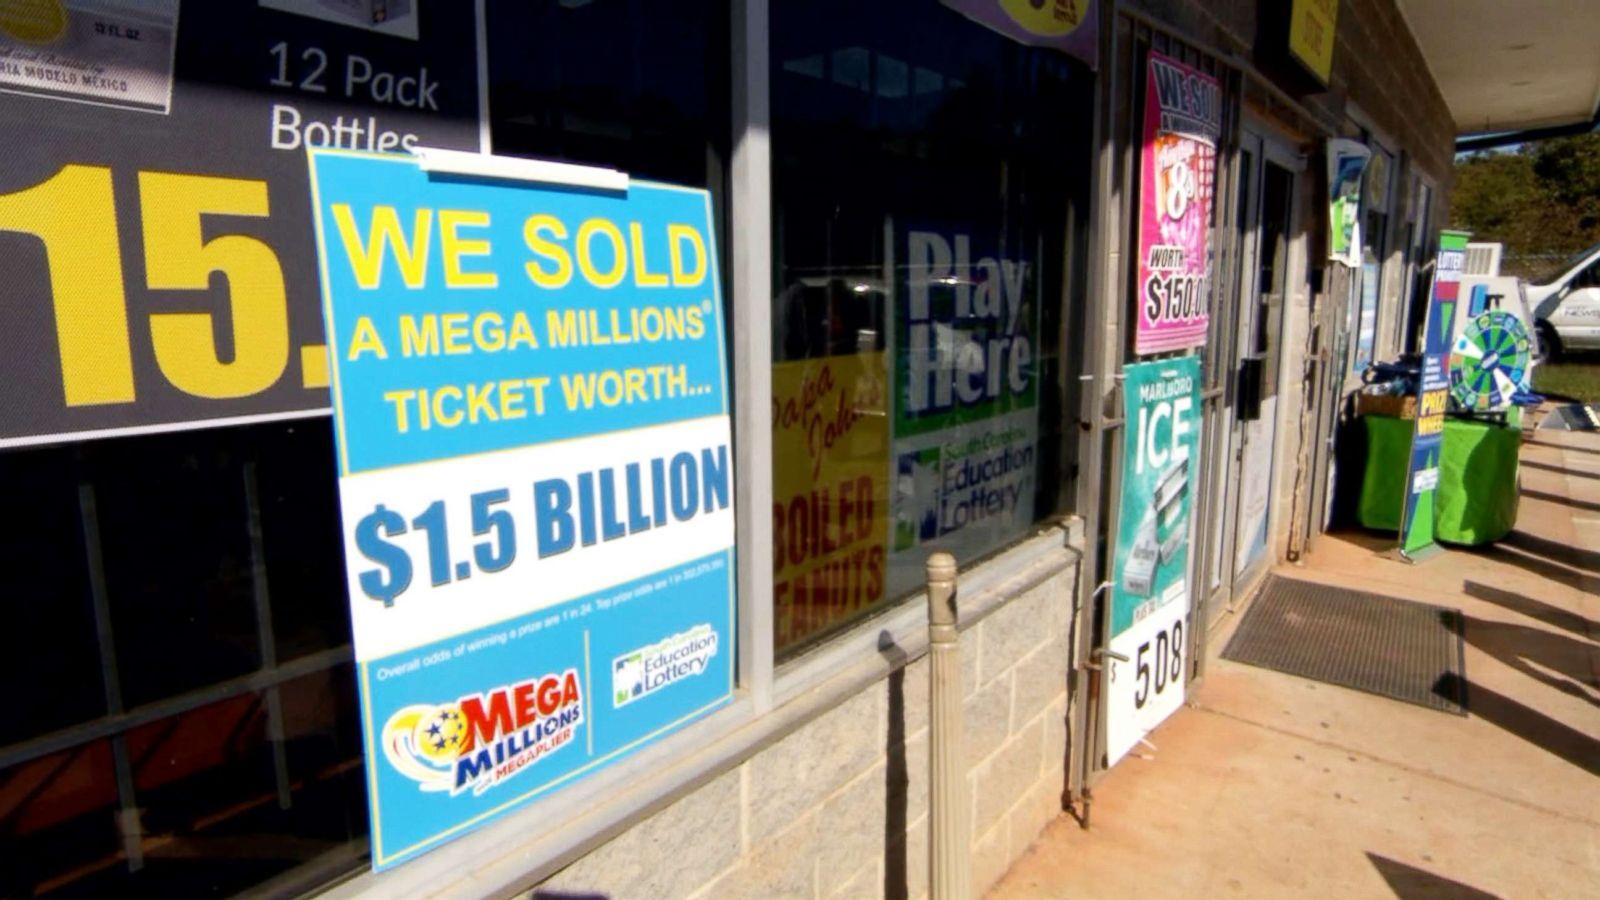 Mystery surrounds $1 5 billion Mega Millions jackpot winner who